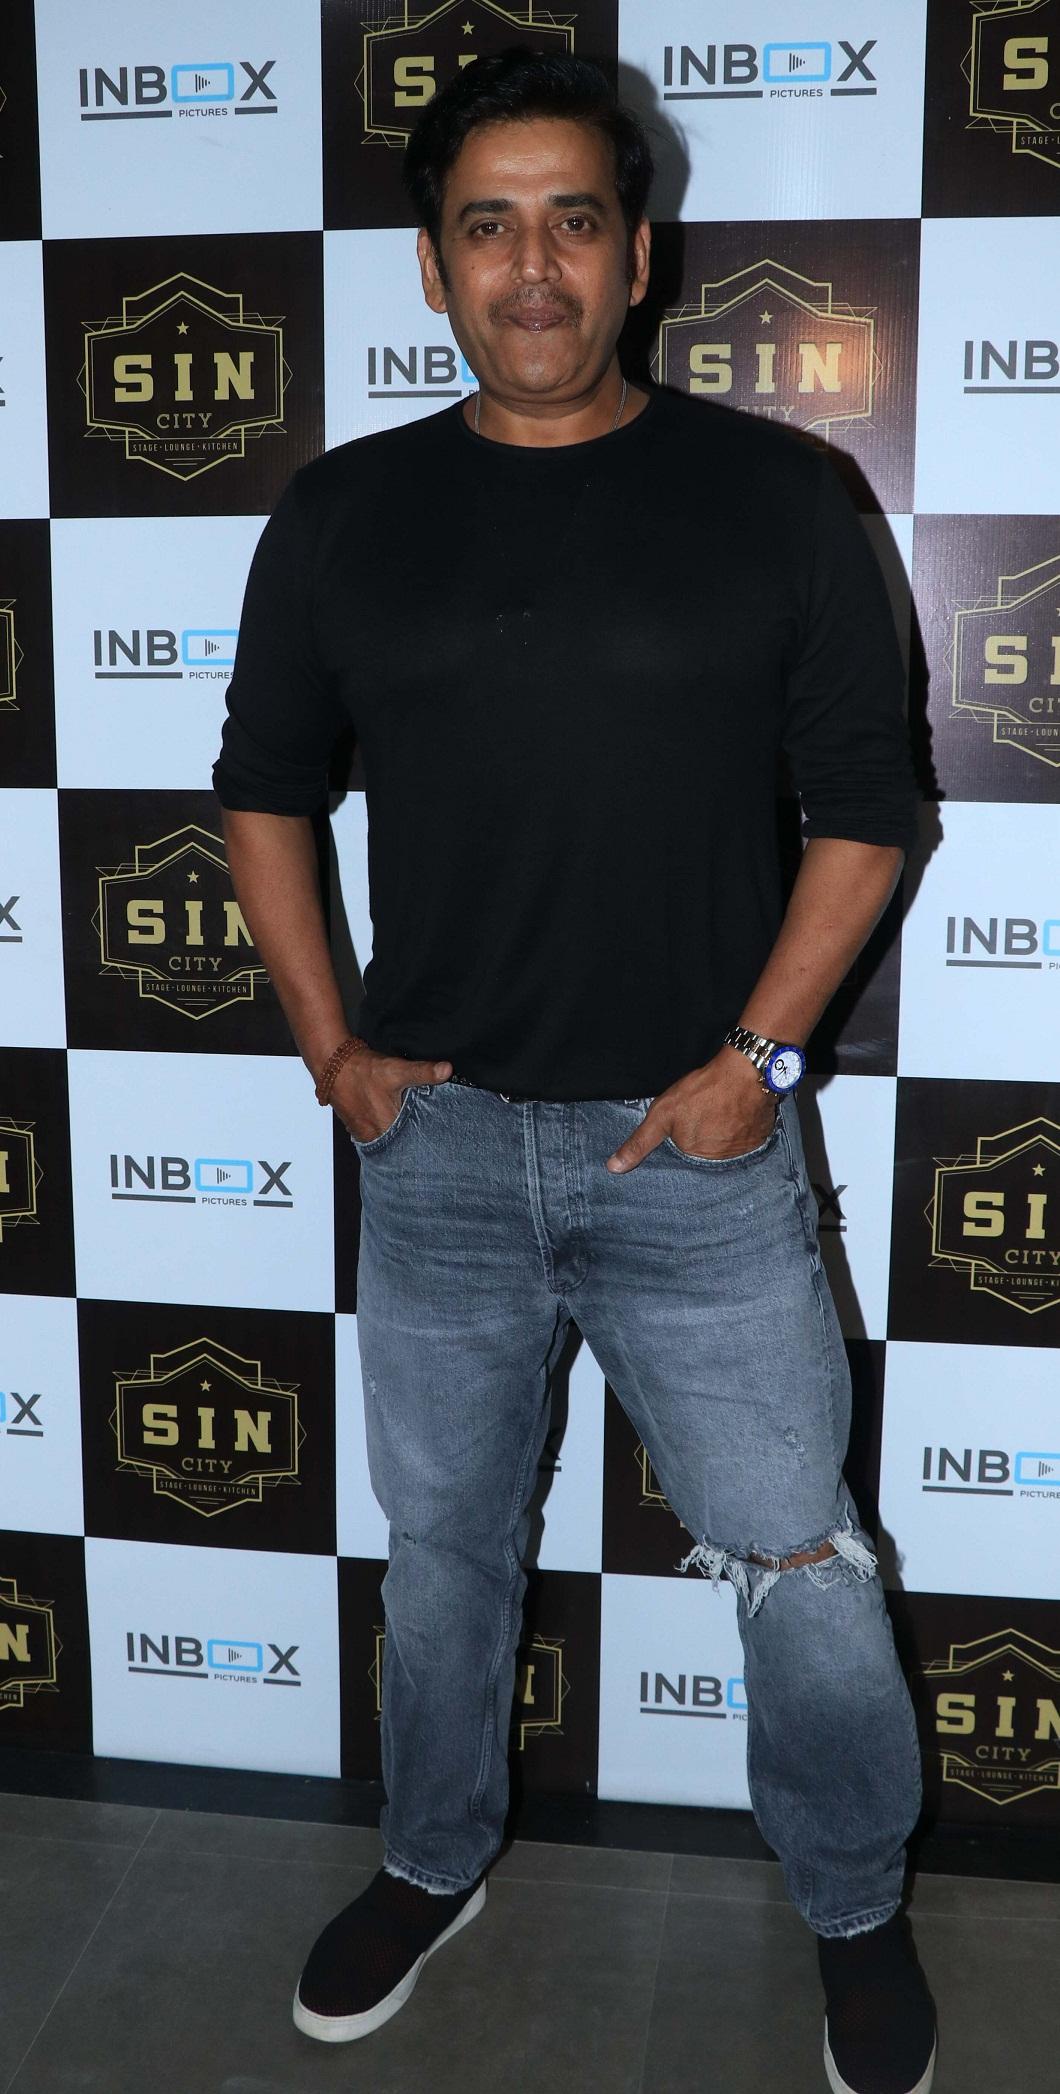 Bollywood Tadka, सतीश कौशिक इमेज, सतीश कौशिक फोटो, सतीश कौशिक पिक्चर, बर्थडे इमेज, बर्थडे फोटो, बर्थडे पिक्चर